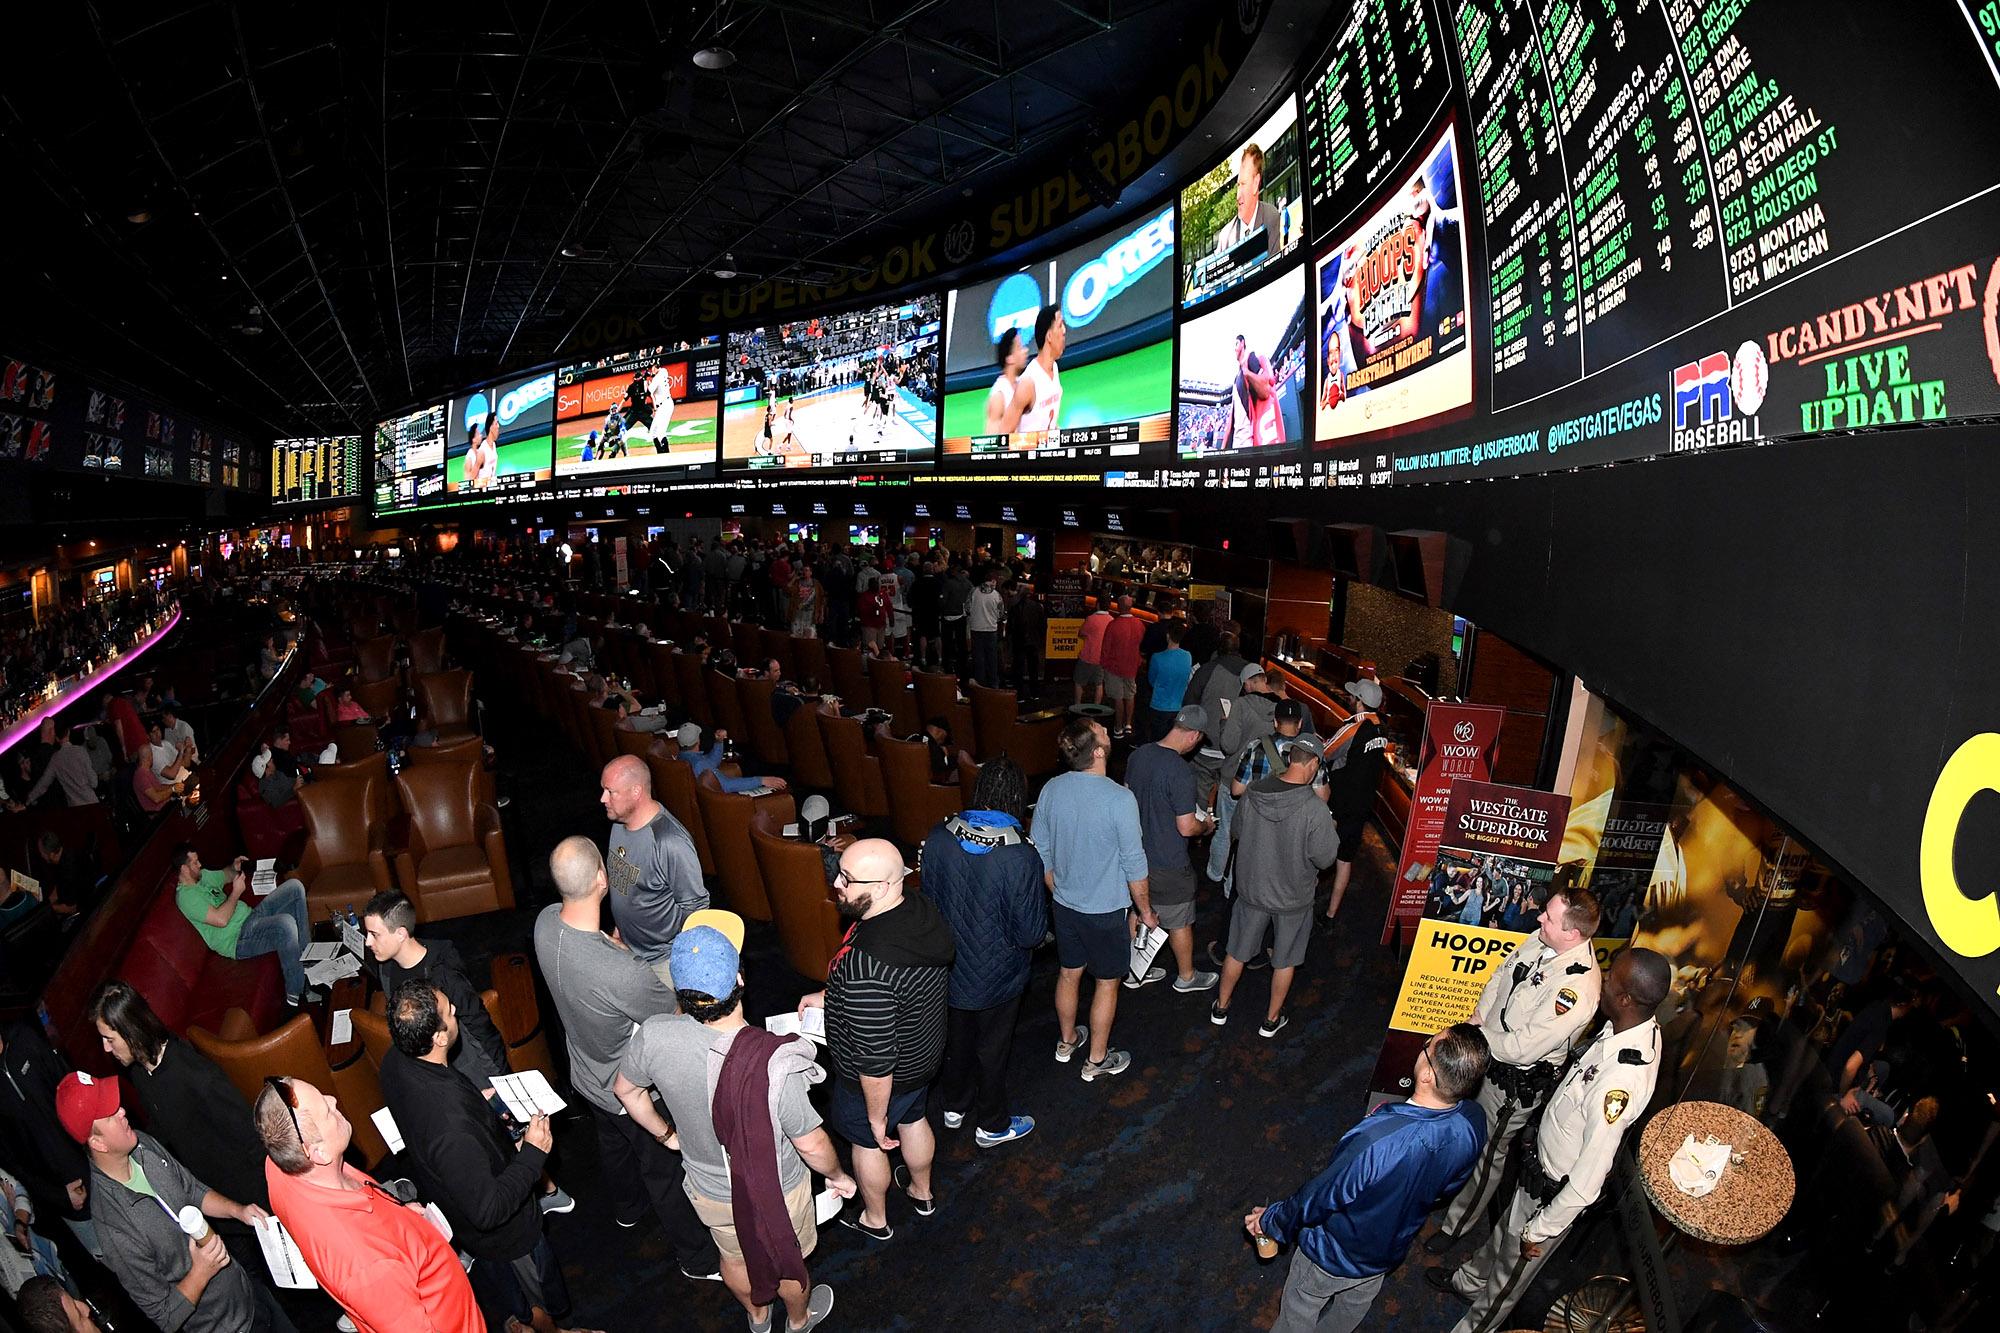 Las vegas nightmare sports betting nrl round 5 betting odds